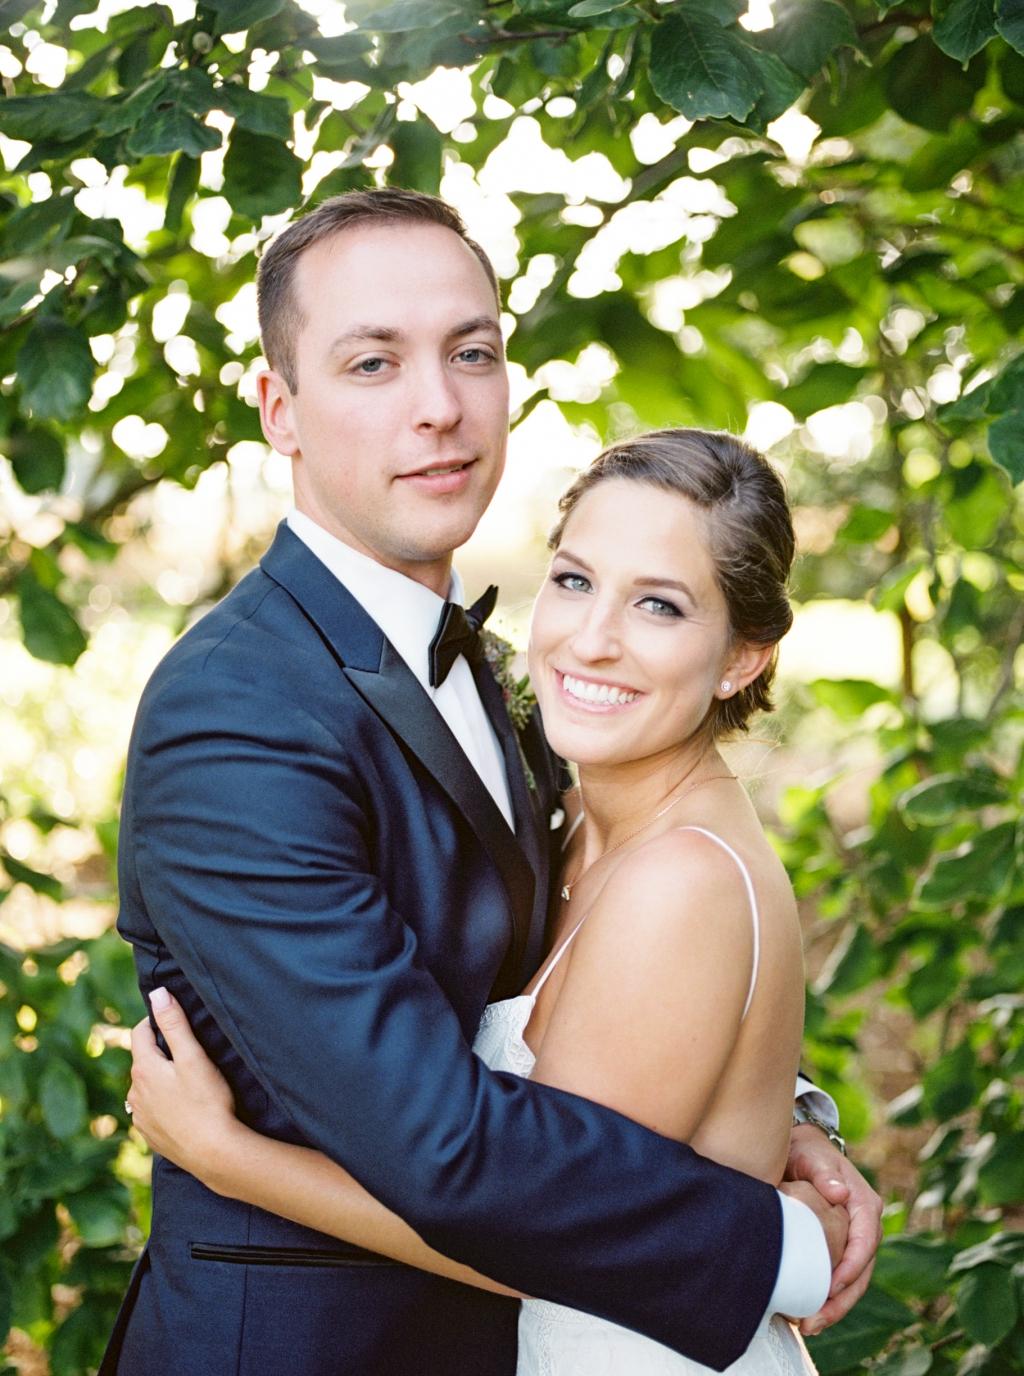 haley-richter-photography-buena-vista-confrence-center-wedding-summer-195